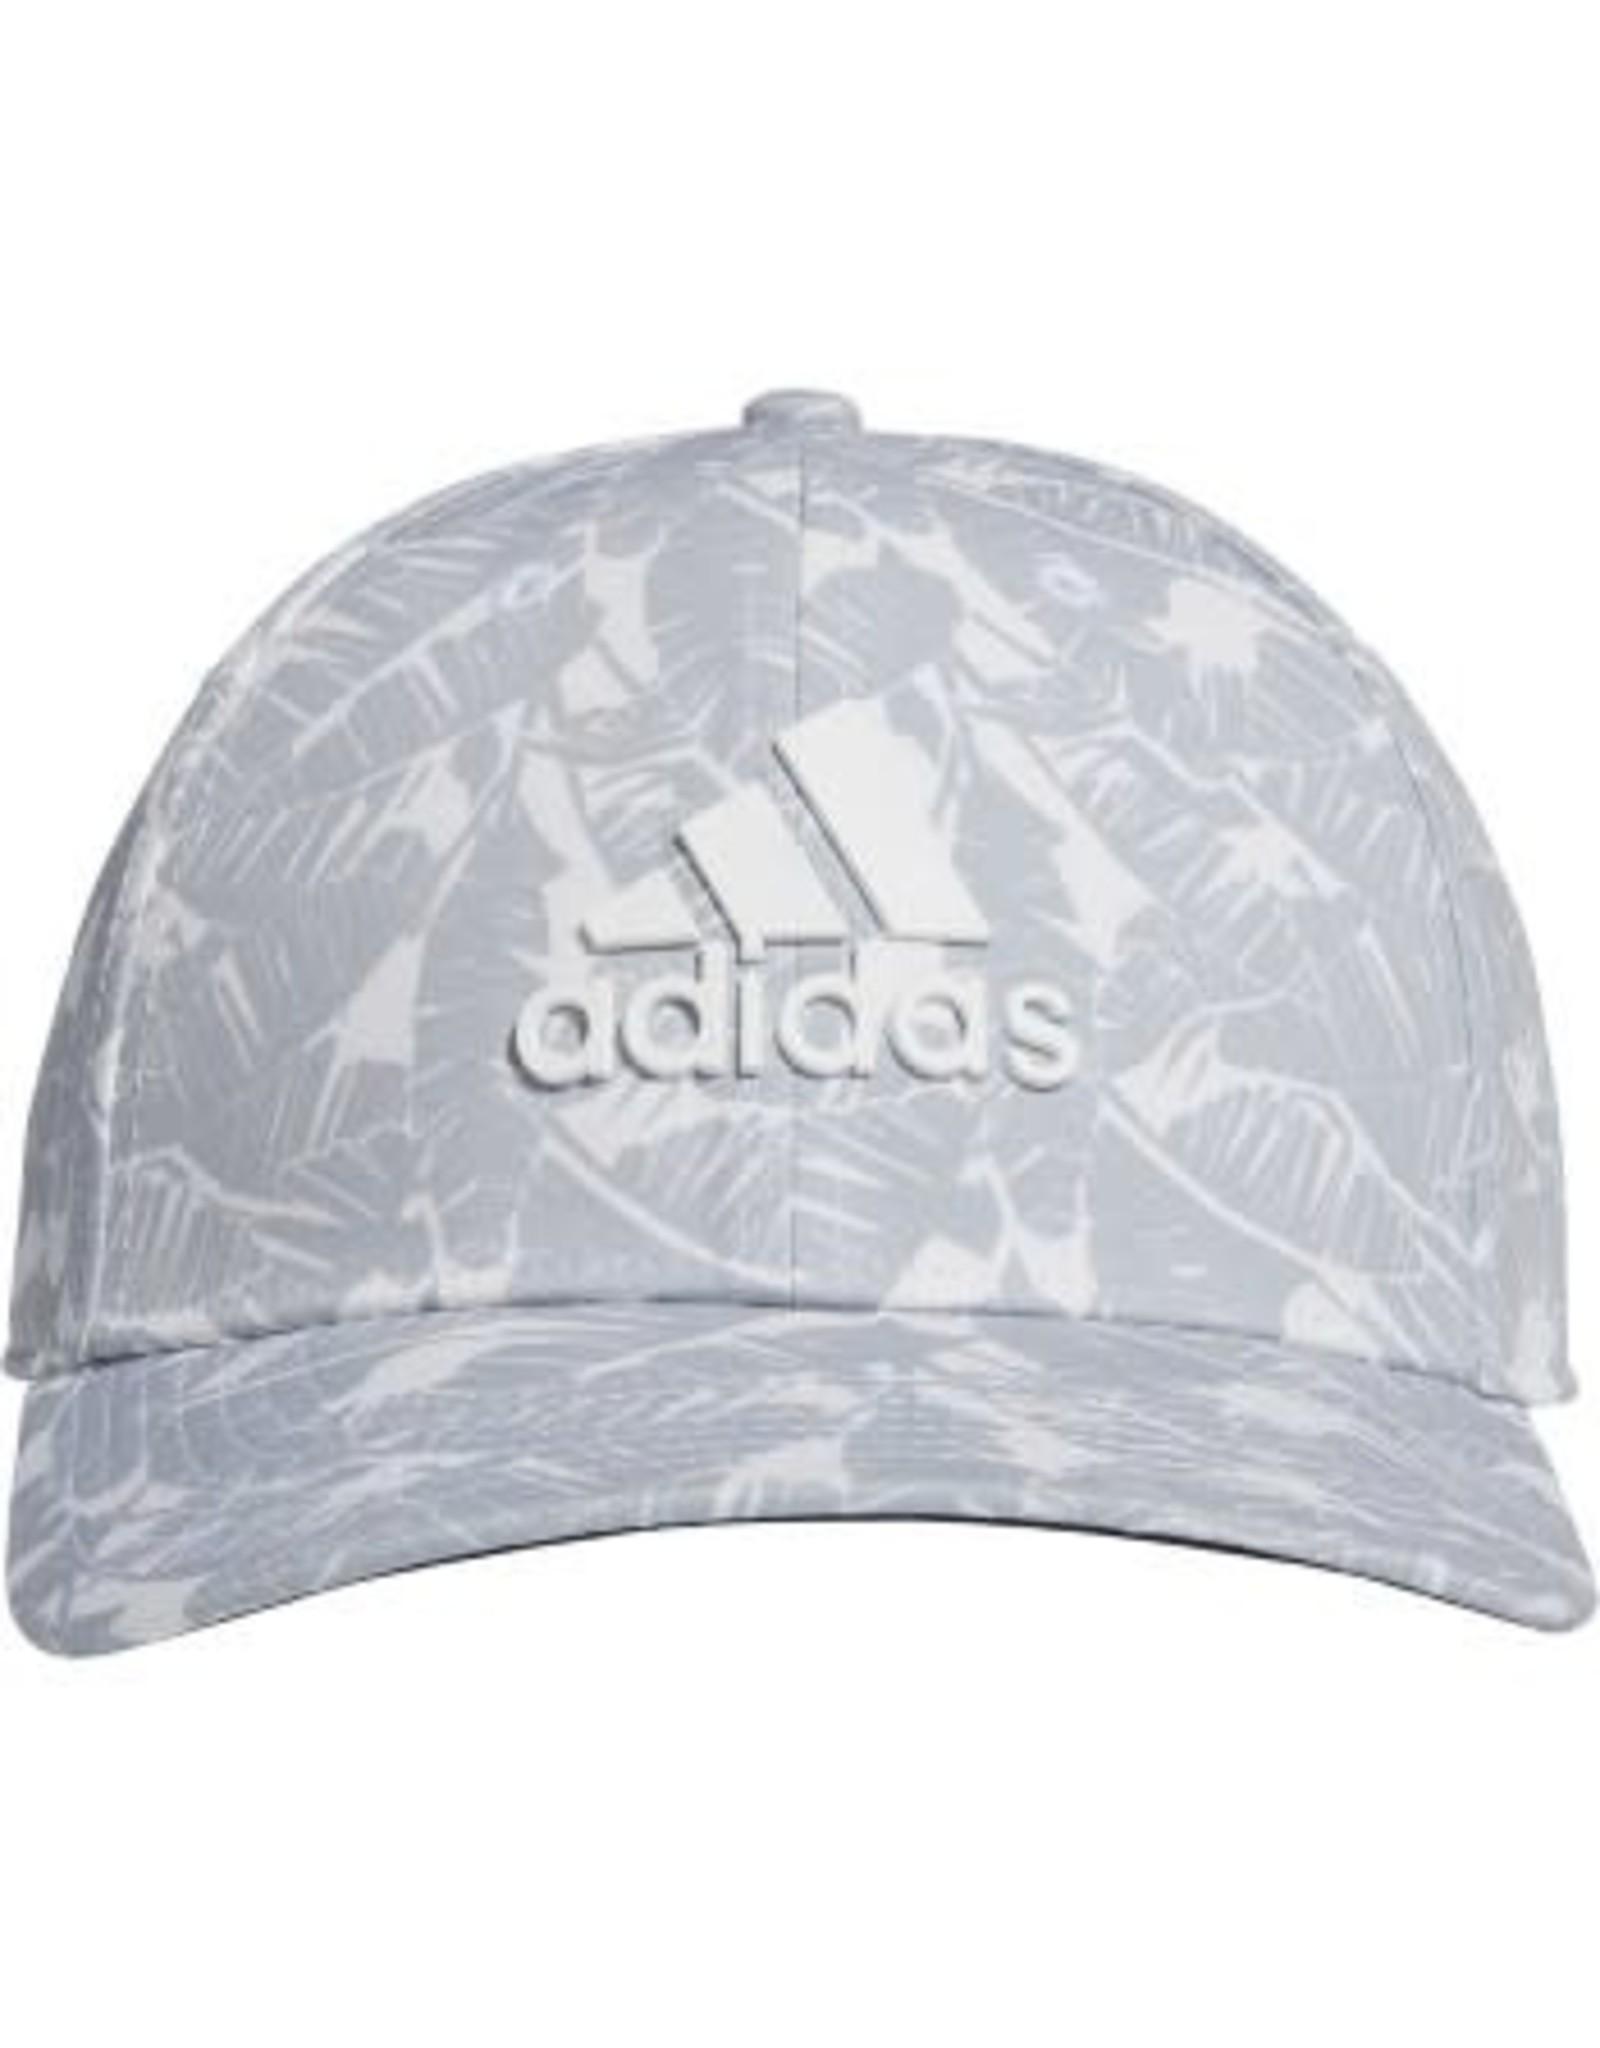 Adidas Adidas Tour Print Men's Hat